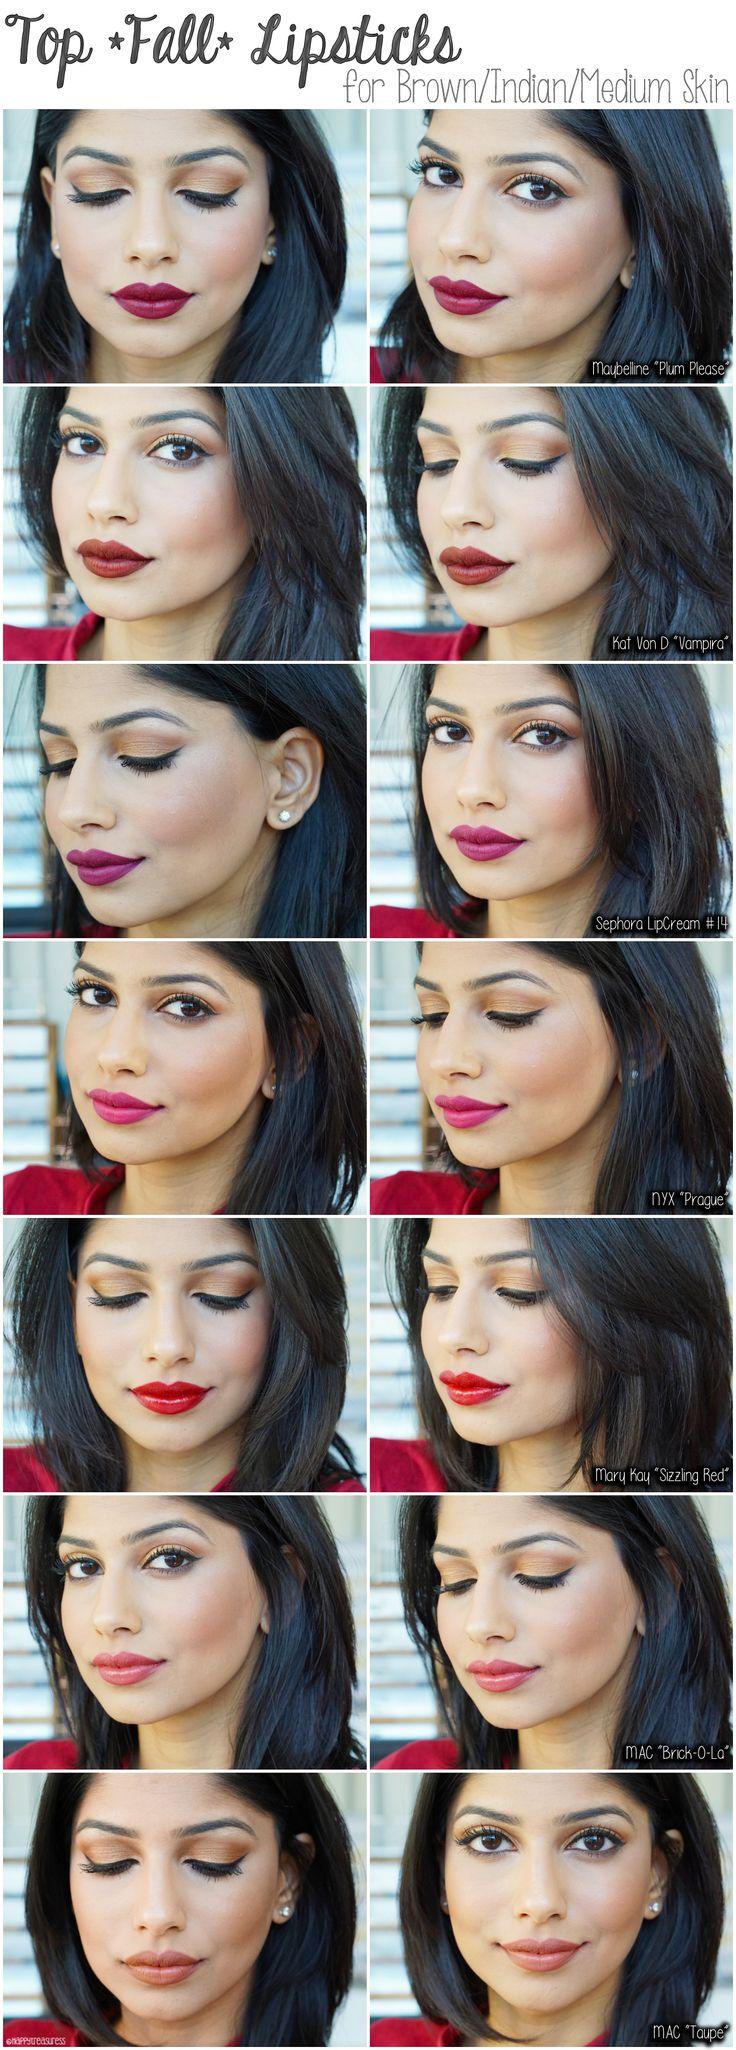 Best 25 Brown Skin Makeup Ideas On Pinterest  Makeup For -1308